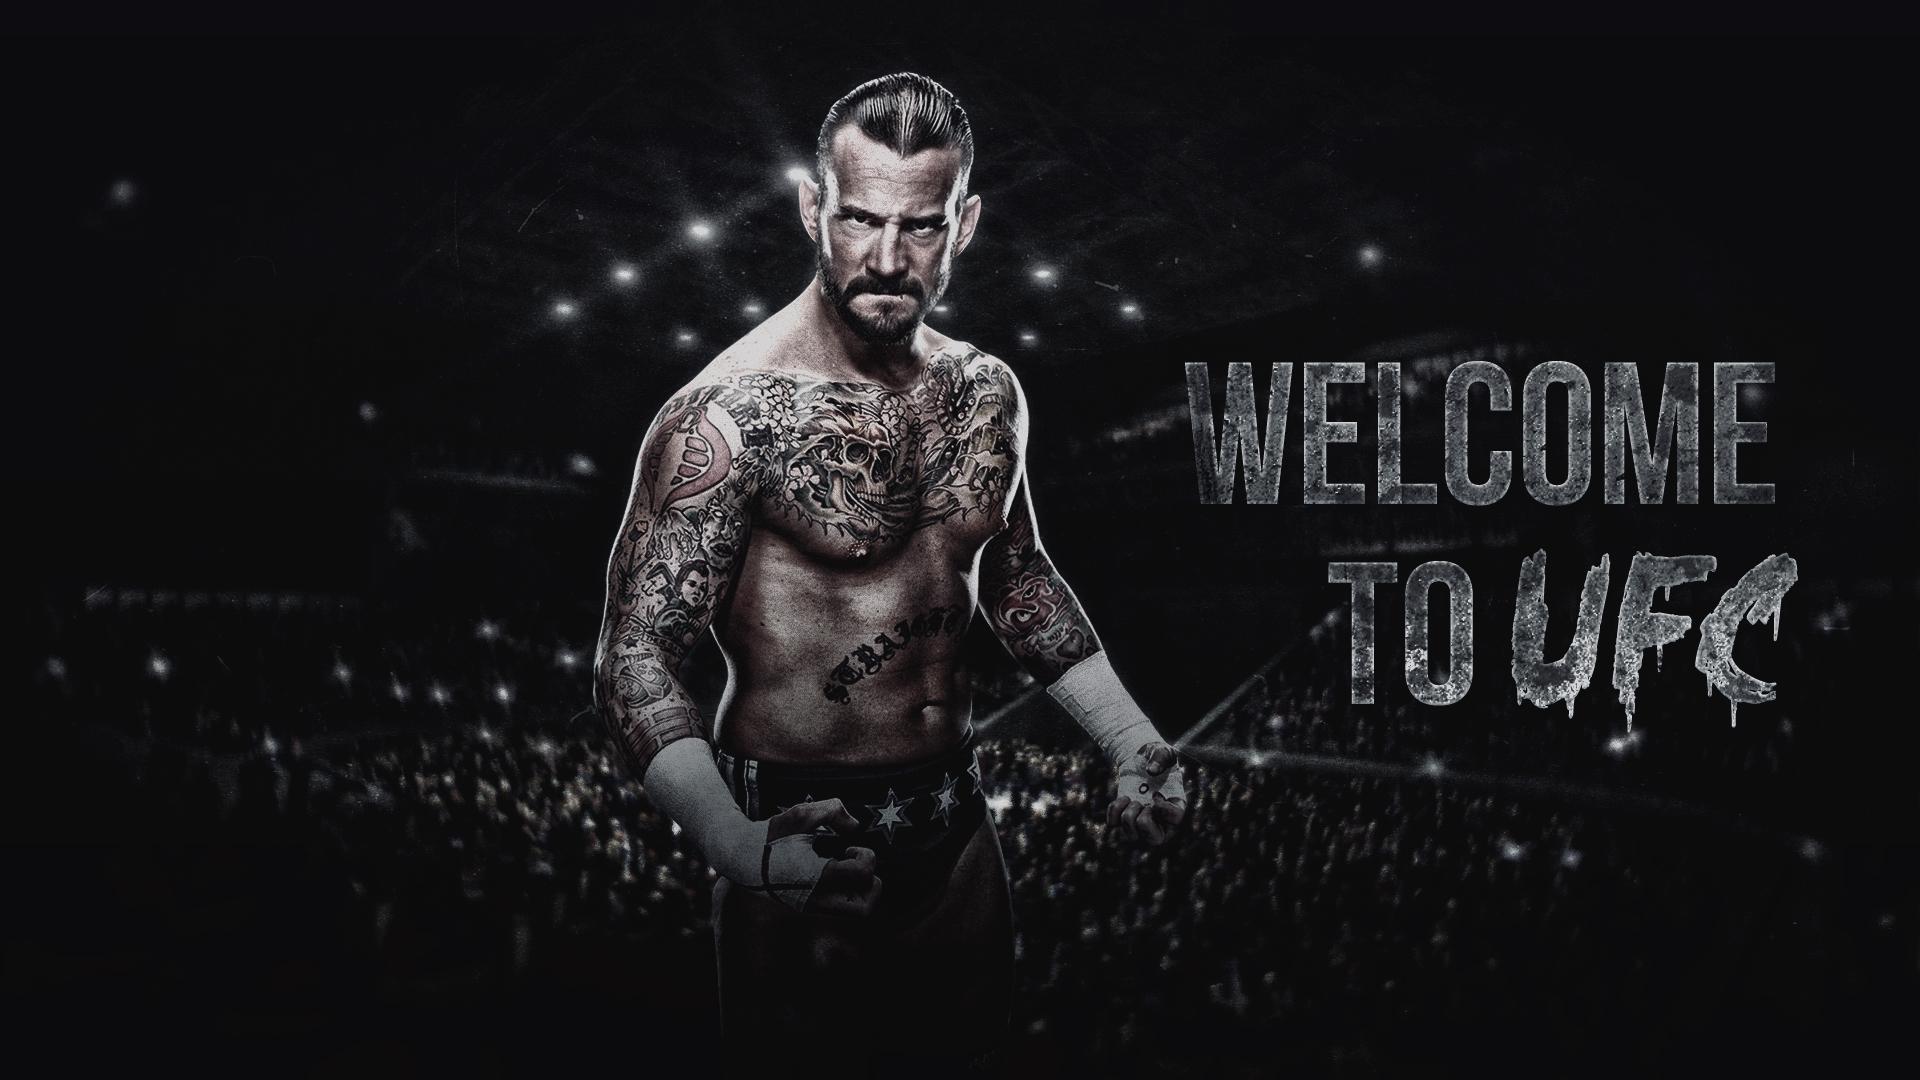 UFC CM Punk Wallpaper 1920x1080